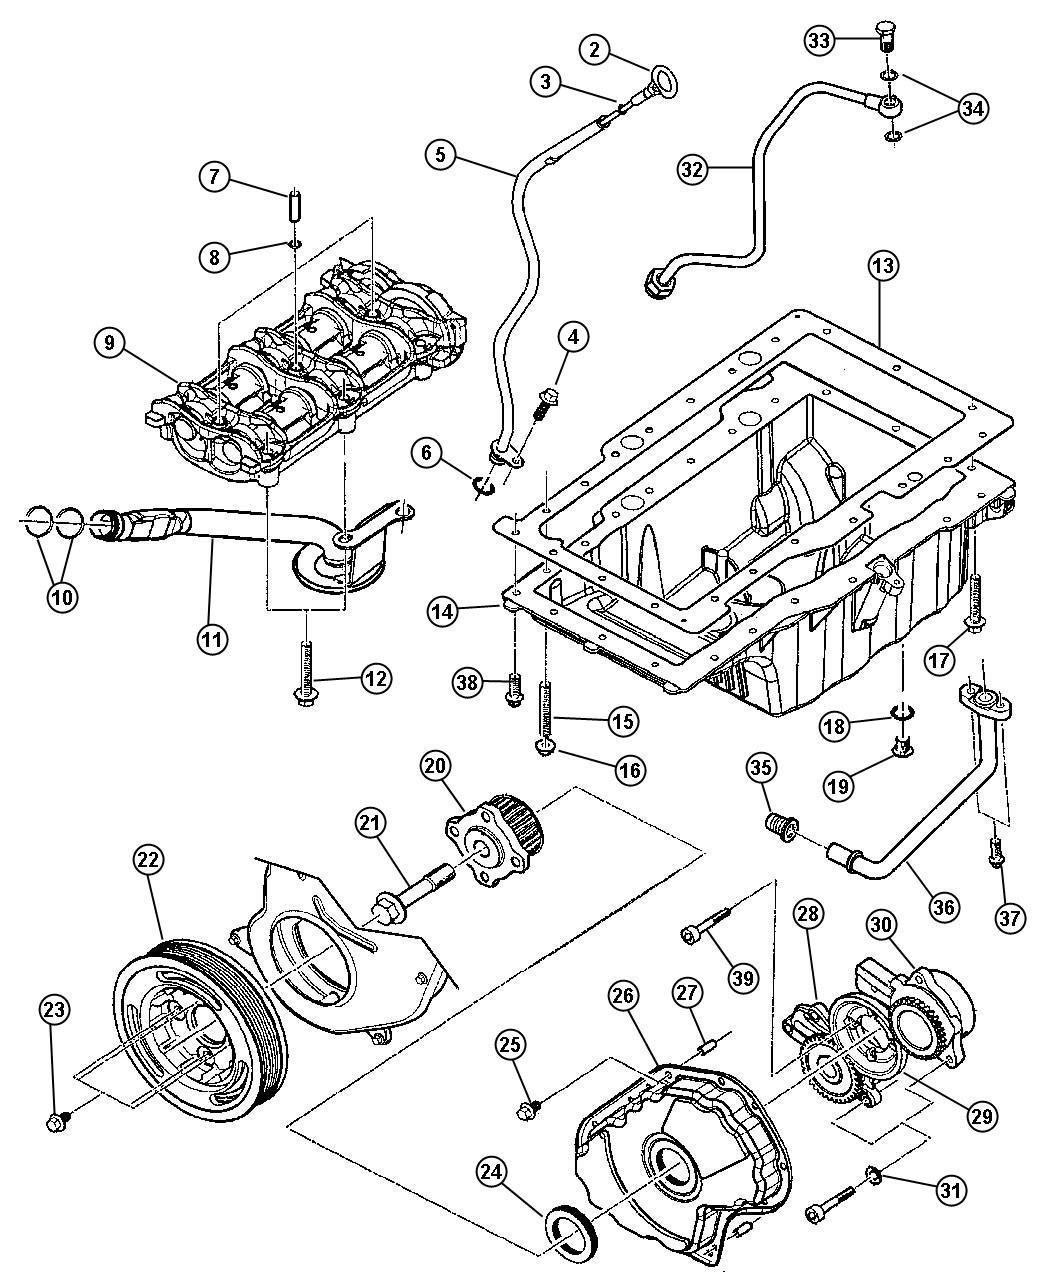 Jeep Liberty Pulley Crankshaft Enginesel Enr